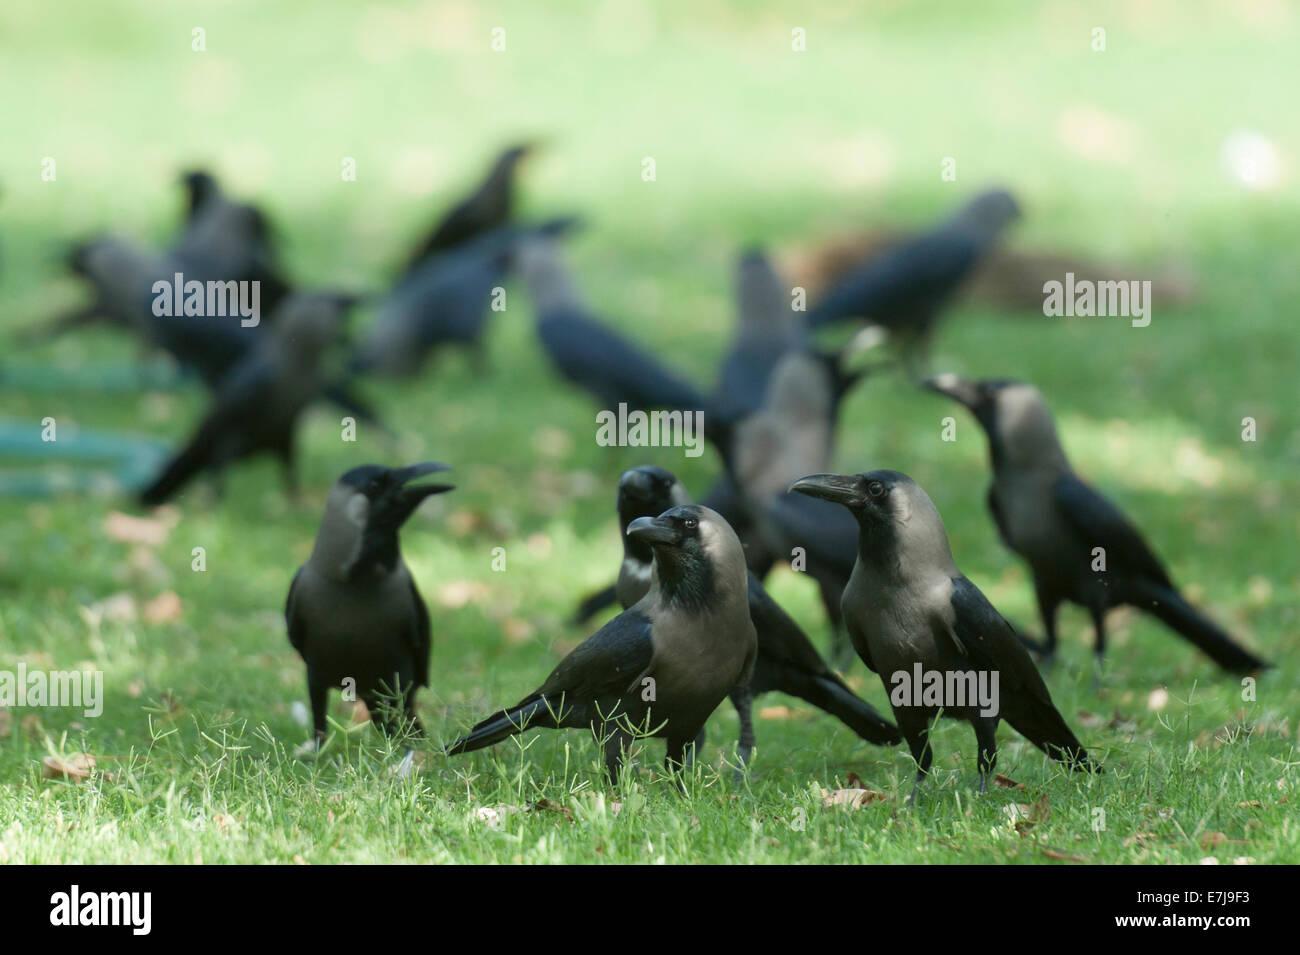 Haus-Krähe, Corvus Splendens, Rabenvögel, Jaipur, Rajasthan, Indien, Asien Stockbild